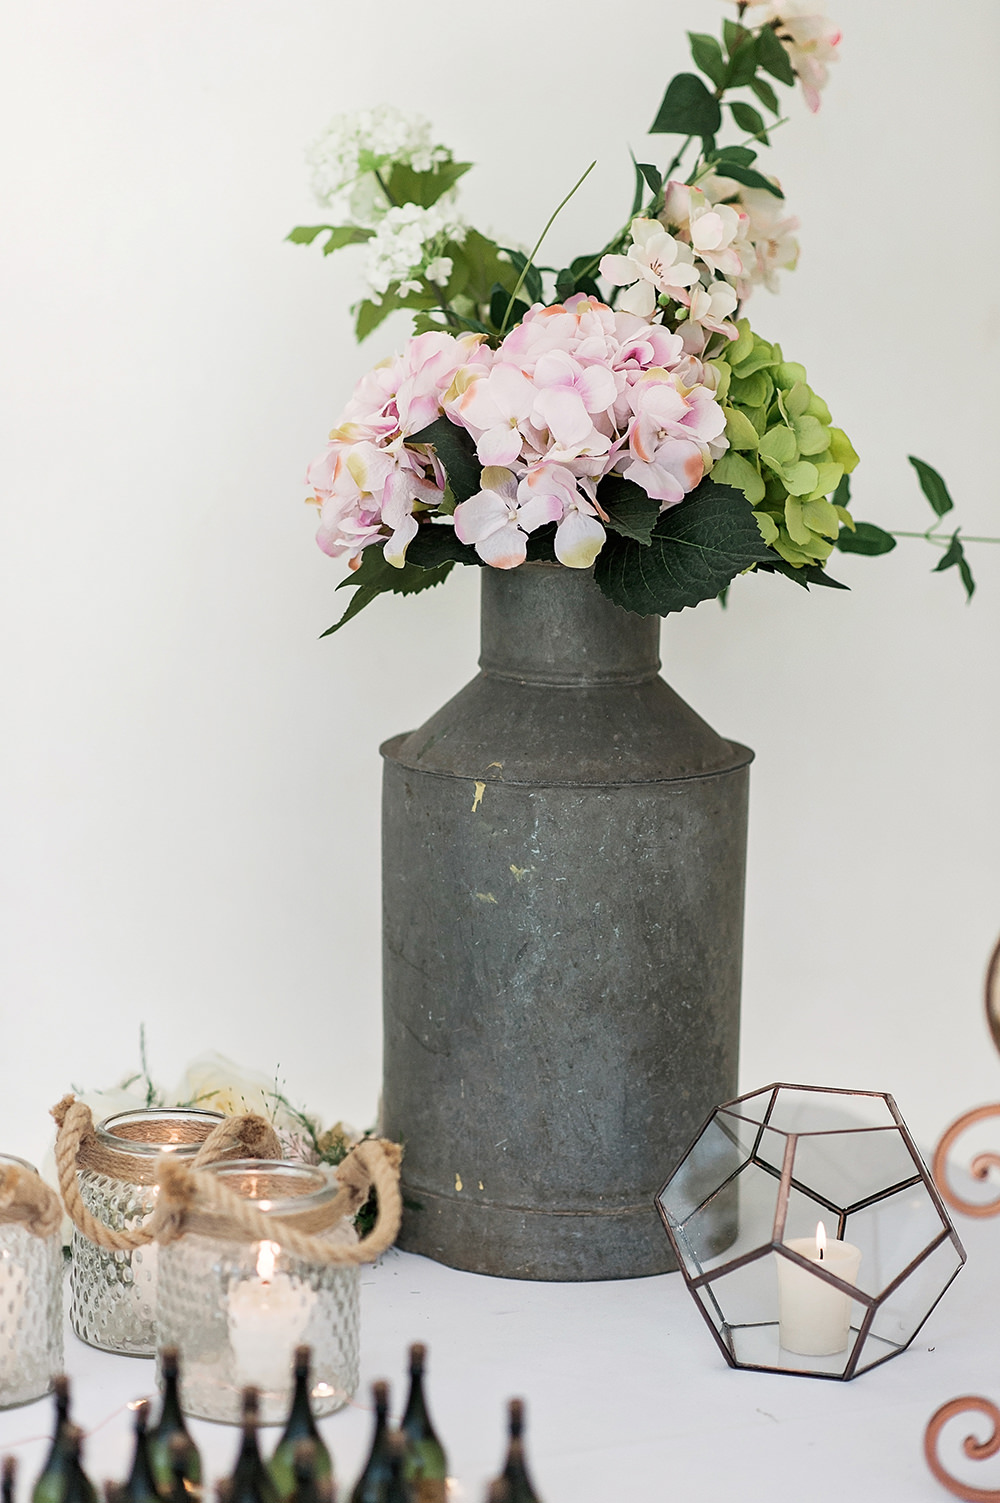 Milk Churn Floral Arrangement Geometric Candle Holiday Edmondsham House Wedding Darima Frampton Photography